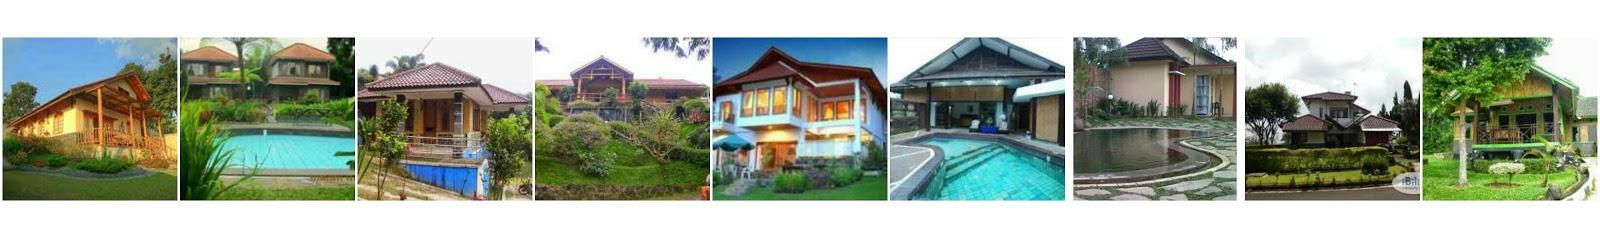 property purchasing process in bali